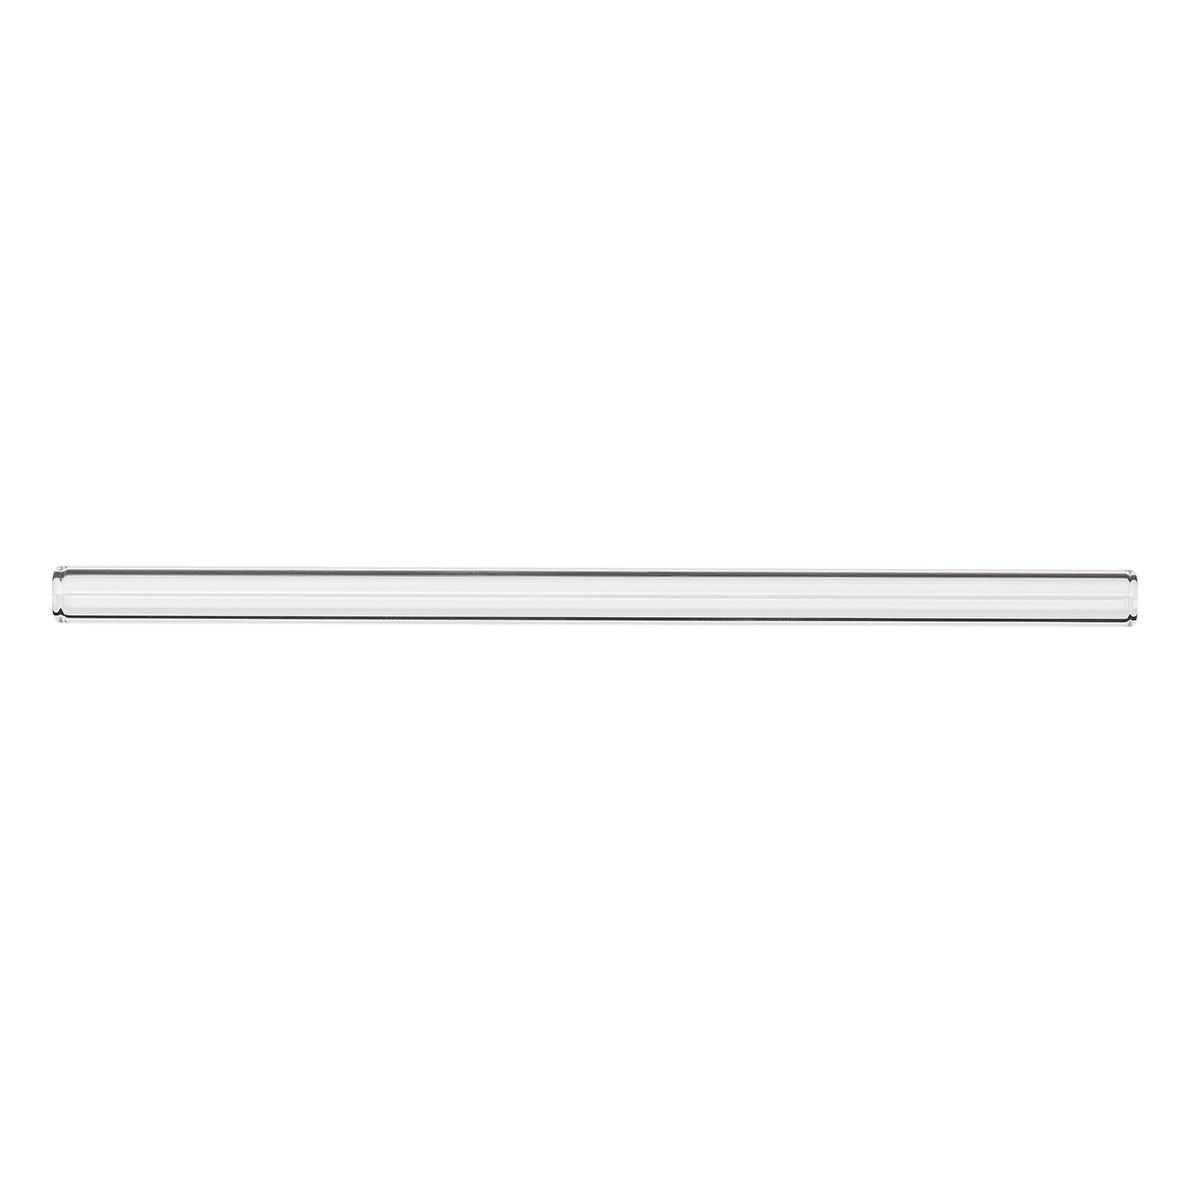 14-2017-32-trinkhalme-aus-glas-glaswerk-long-ansicht1-1200x1200px.jpg